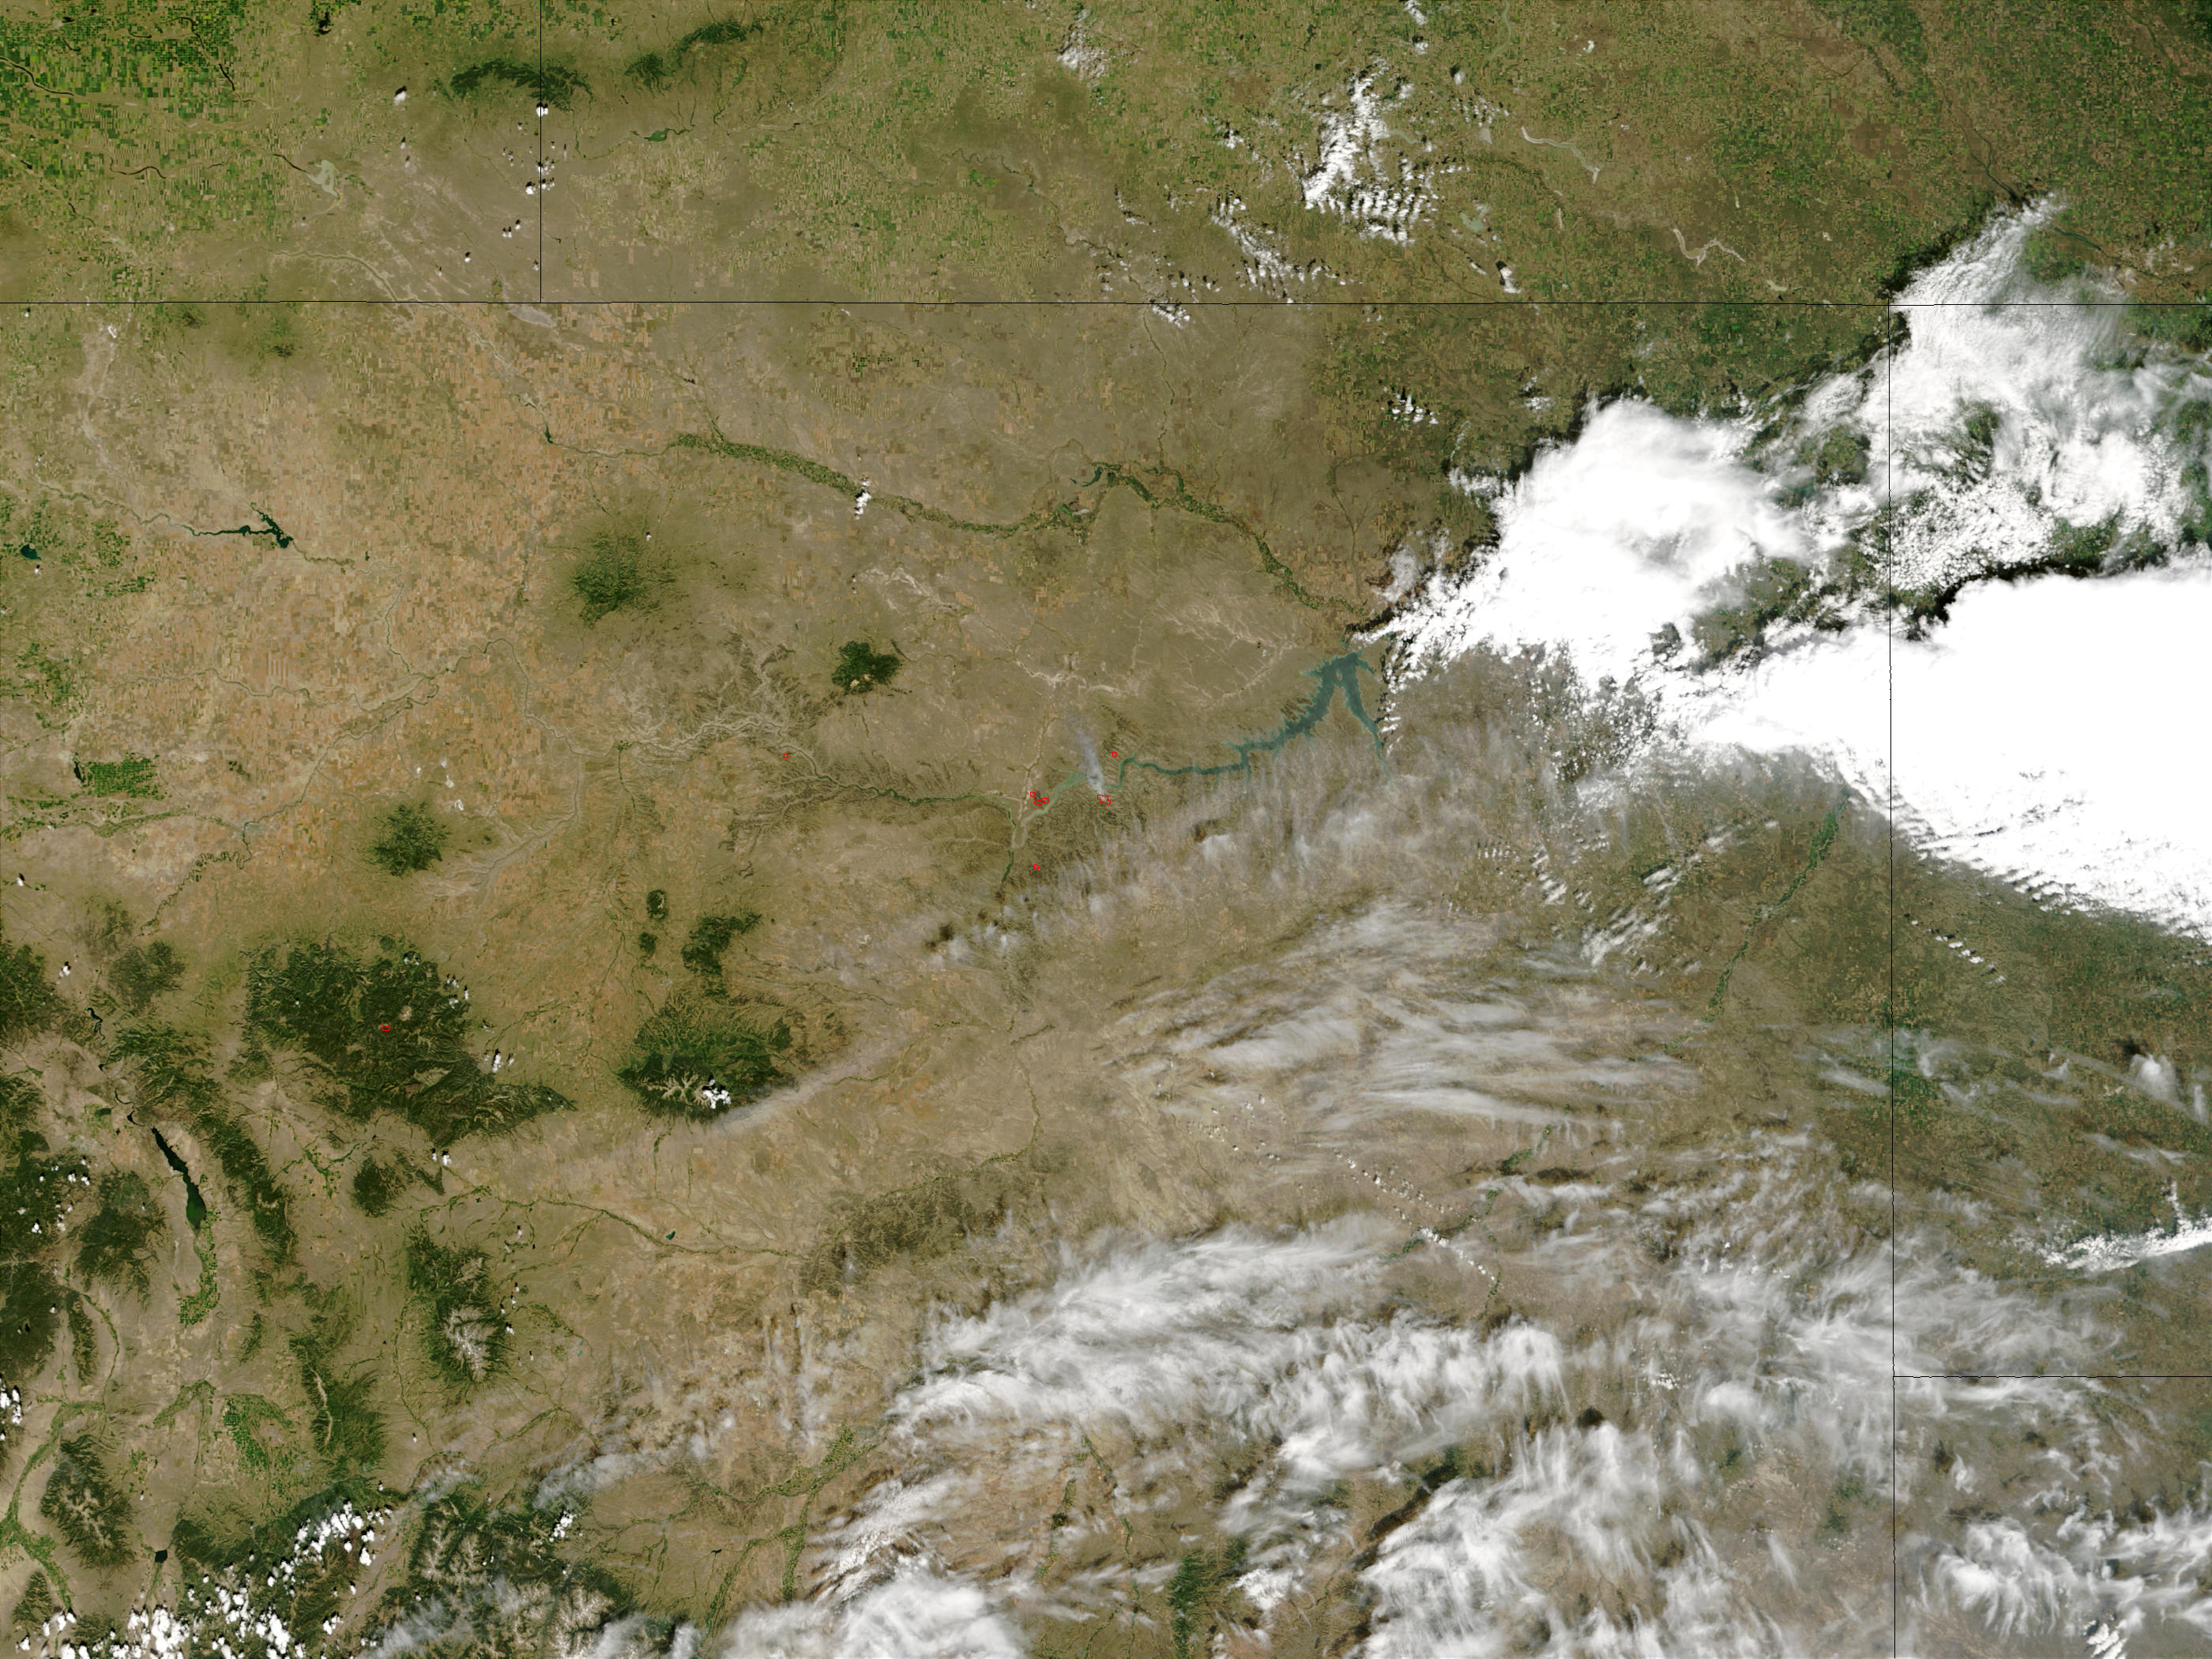 Missouri Breaks Complex Fire, Montana